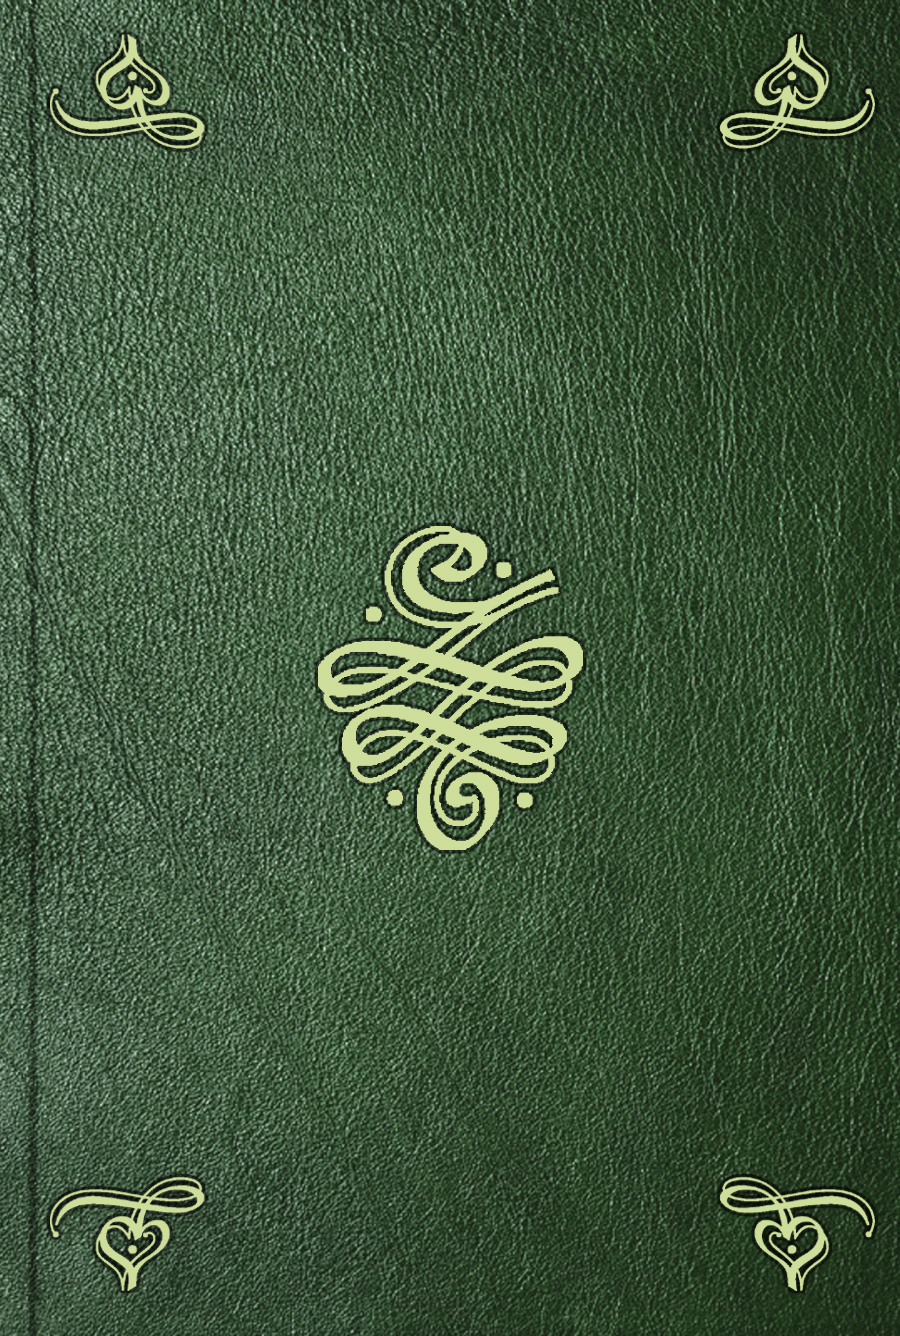 de Caylus Oeuvres badines complettes. T. 10. P. 4 anthony ashley shaftsbury les oeuvres de mylord comte de shaftsbury t 3